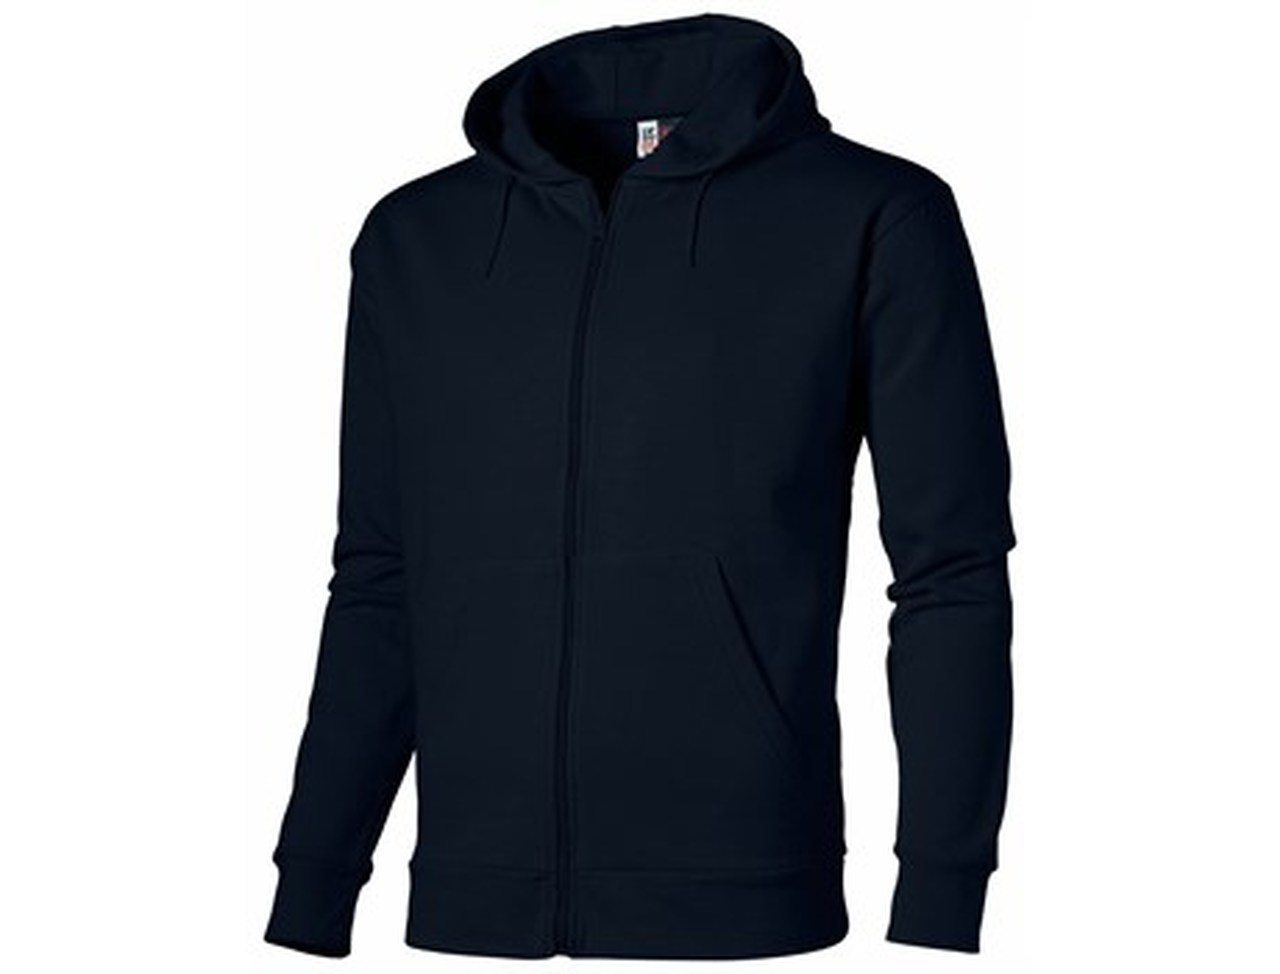 Jackets / Fleece Tops